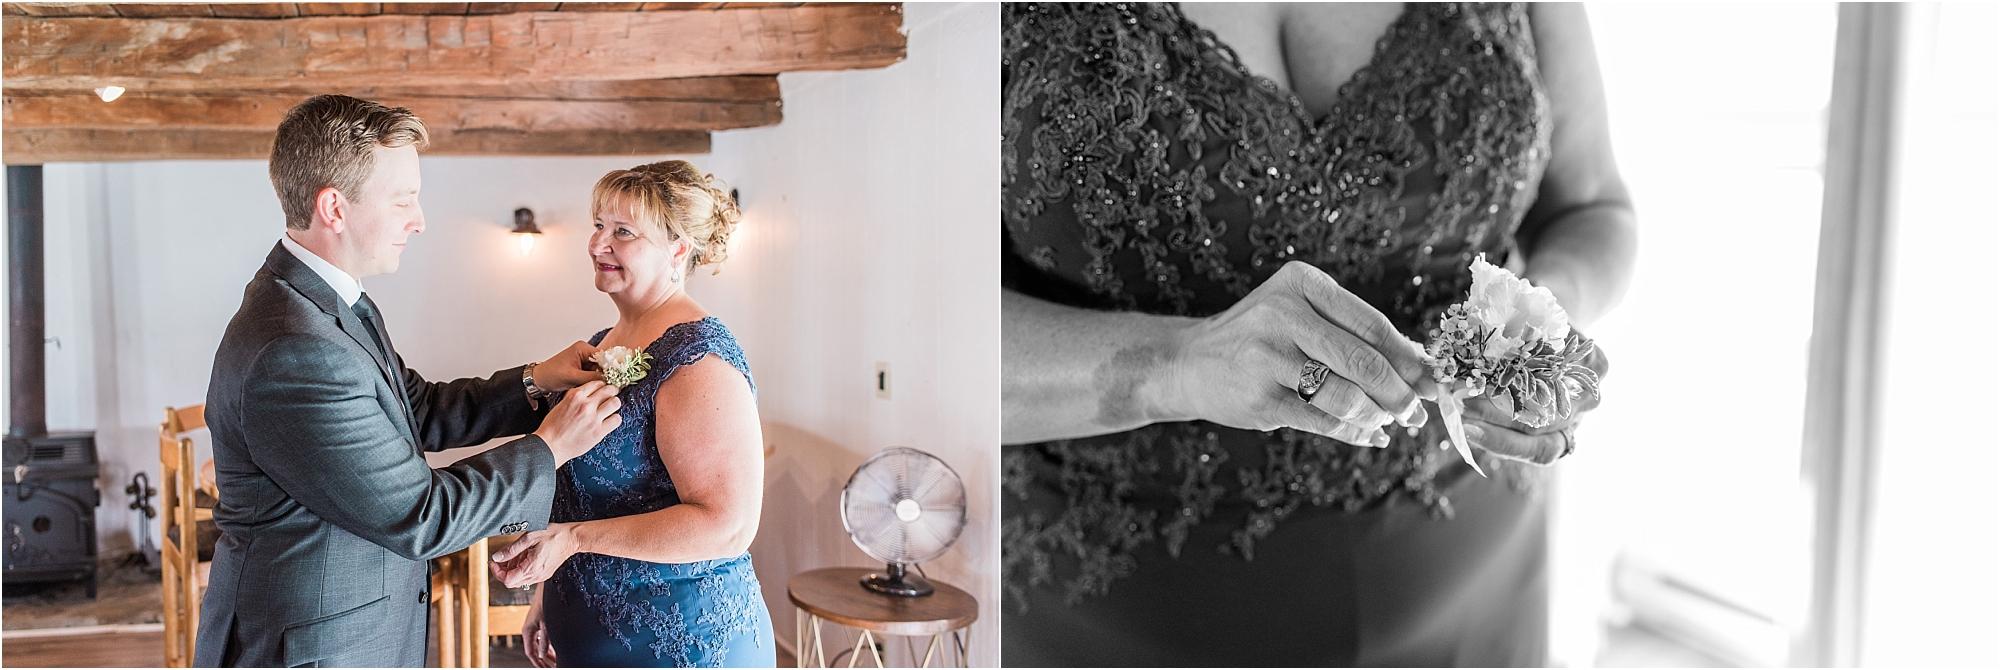 0021 Summer Stonefields Wedding Carleton Place - Ottawa Wedding - Photography by Emma_WEB.jpg